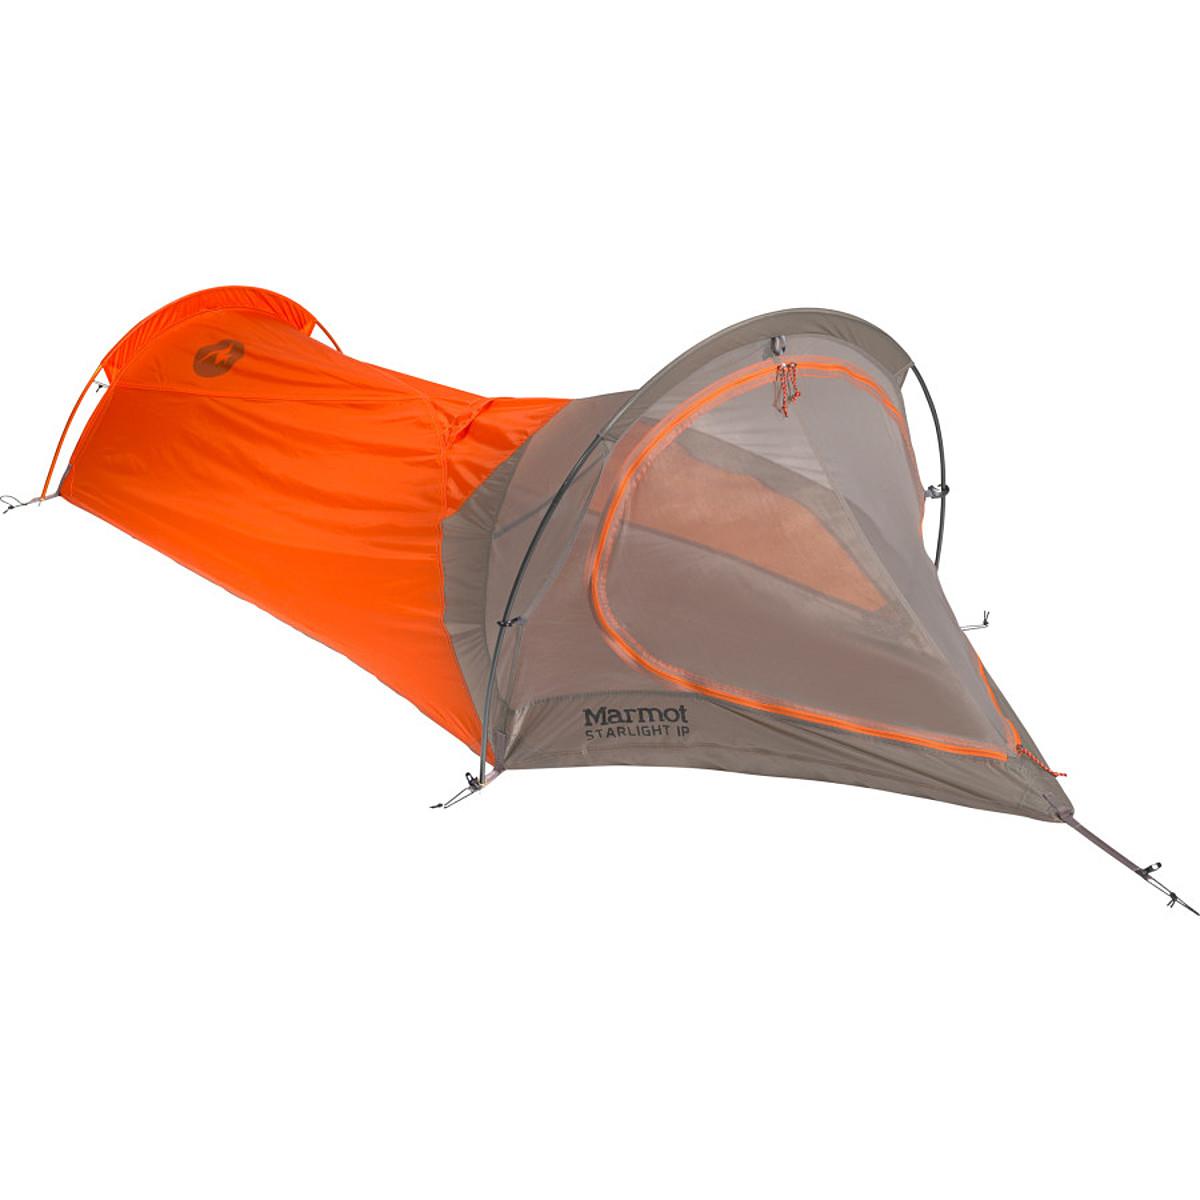 Marmot Starlight 1  sc 1 st  Trailspace & Three-Season Tent Reviews - Trailspace.com